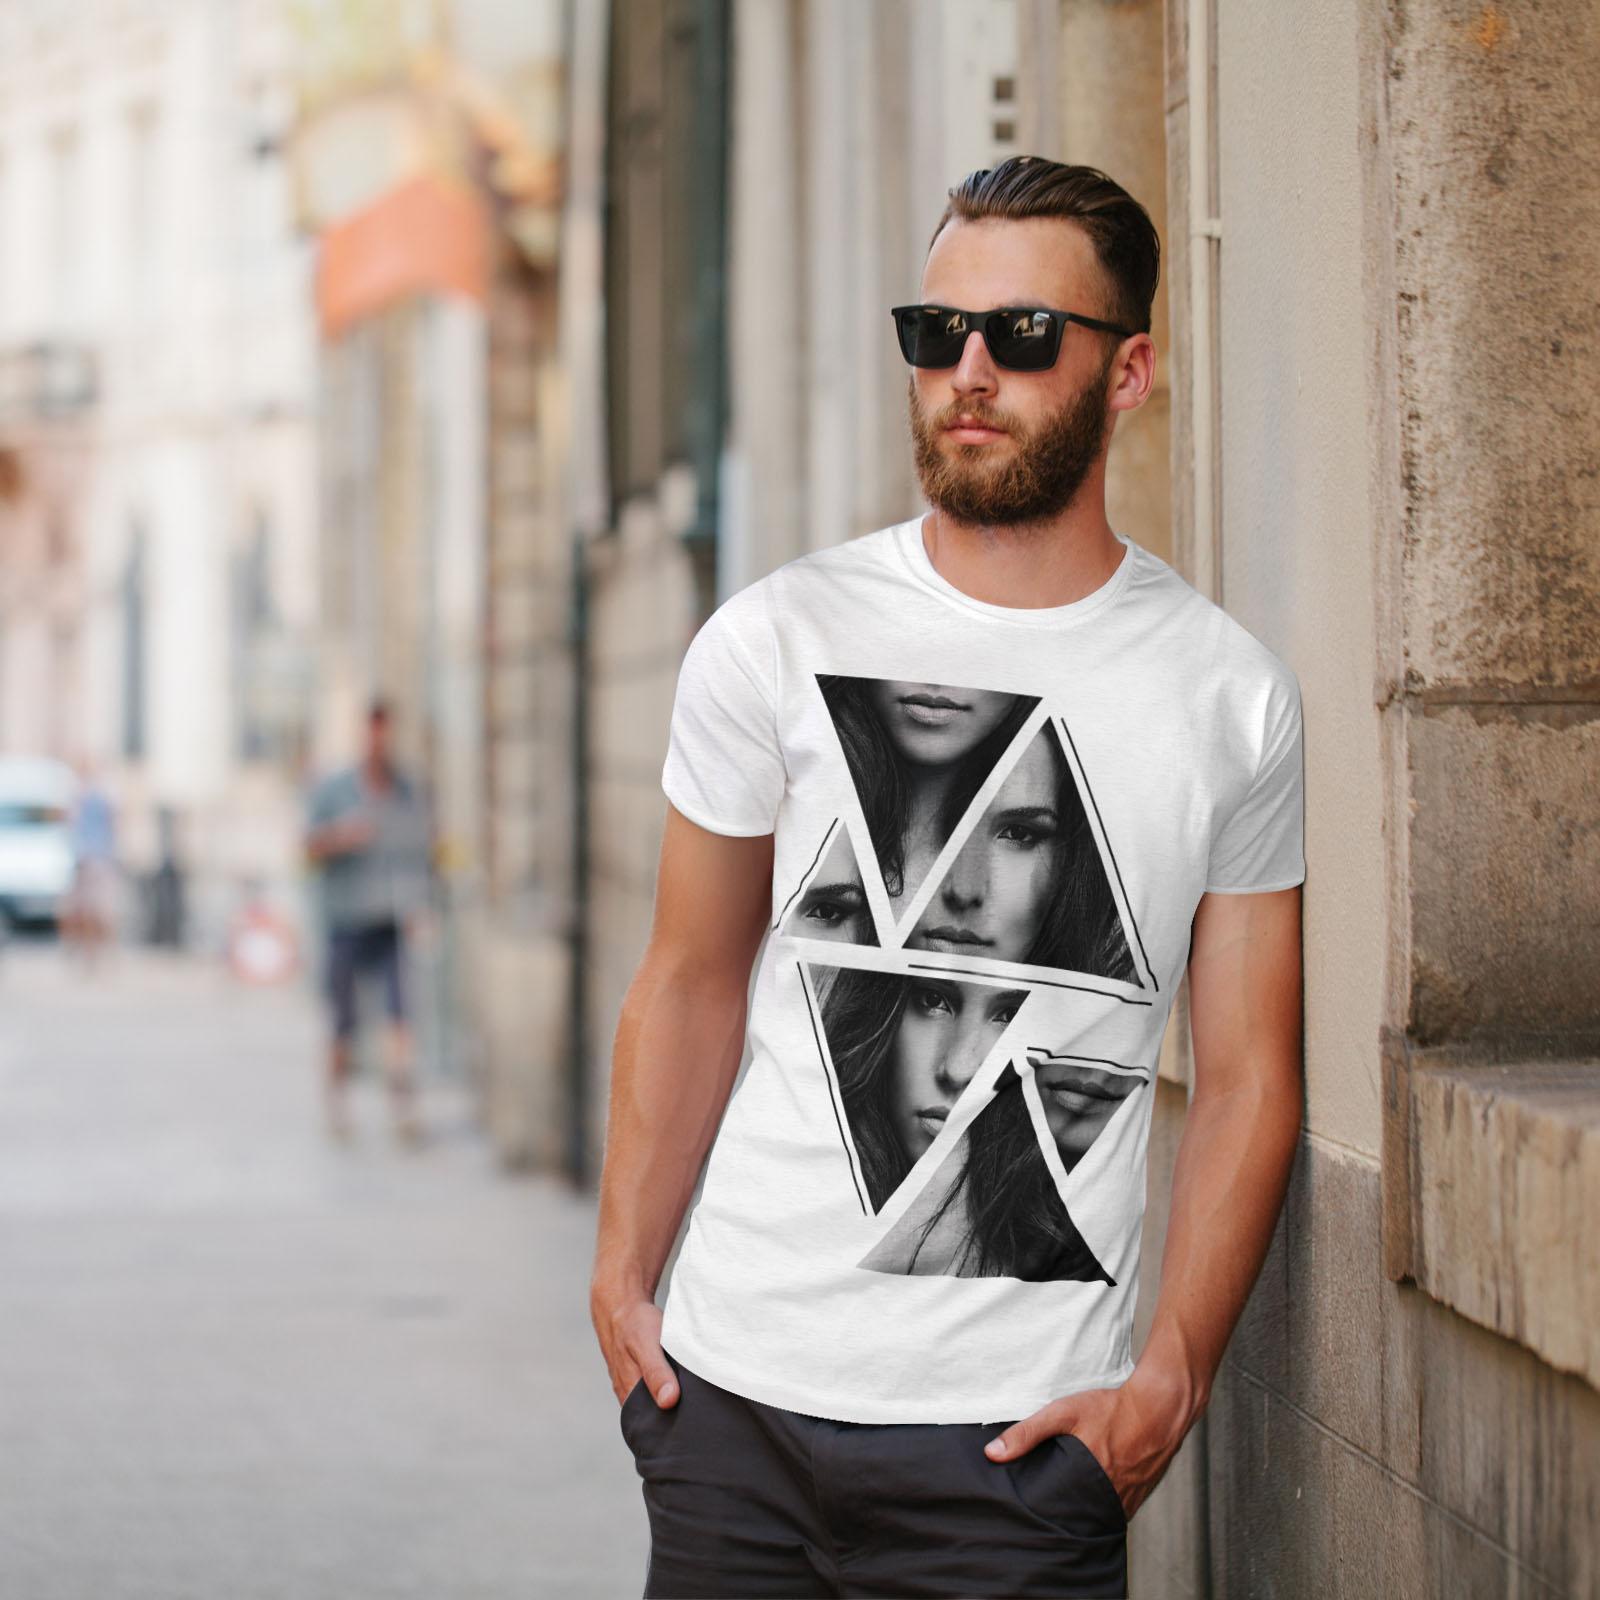 Wellcoda-Art-Fashion-Face-T-shirt-homme-Abstract-Design-graphique-imprime-Tee miniature 11